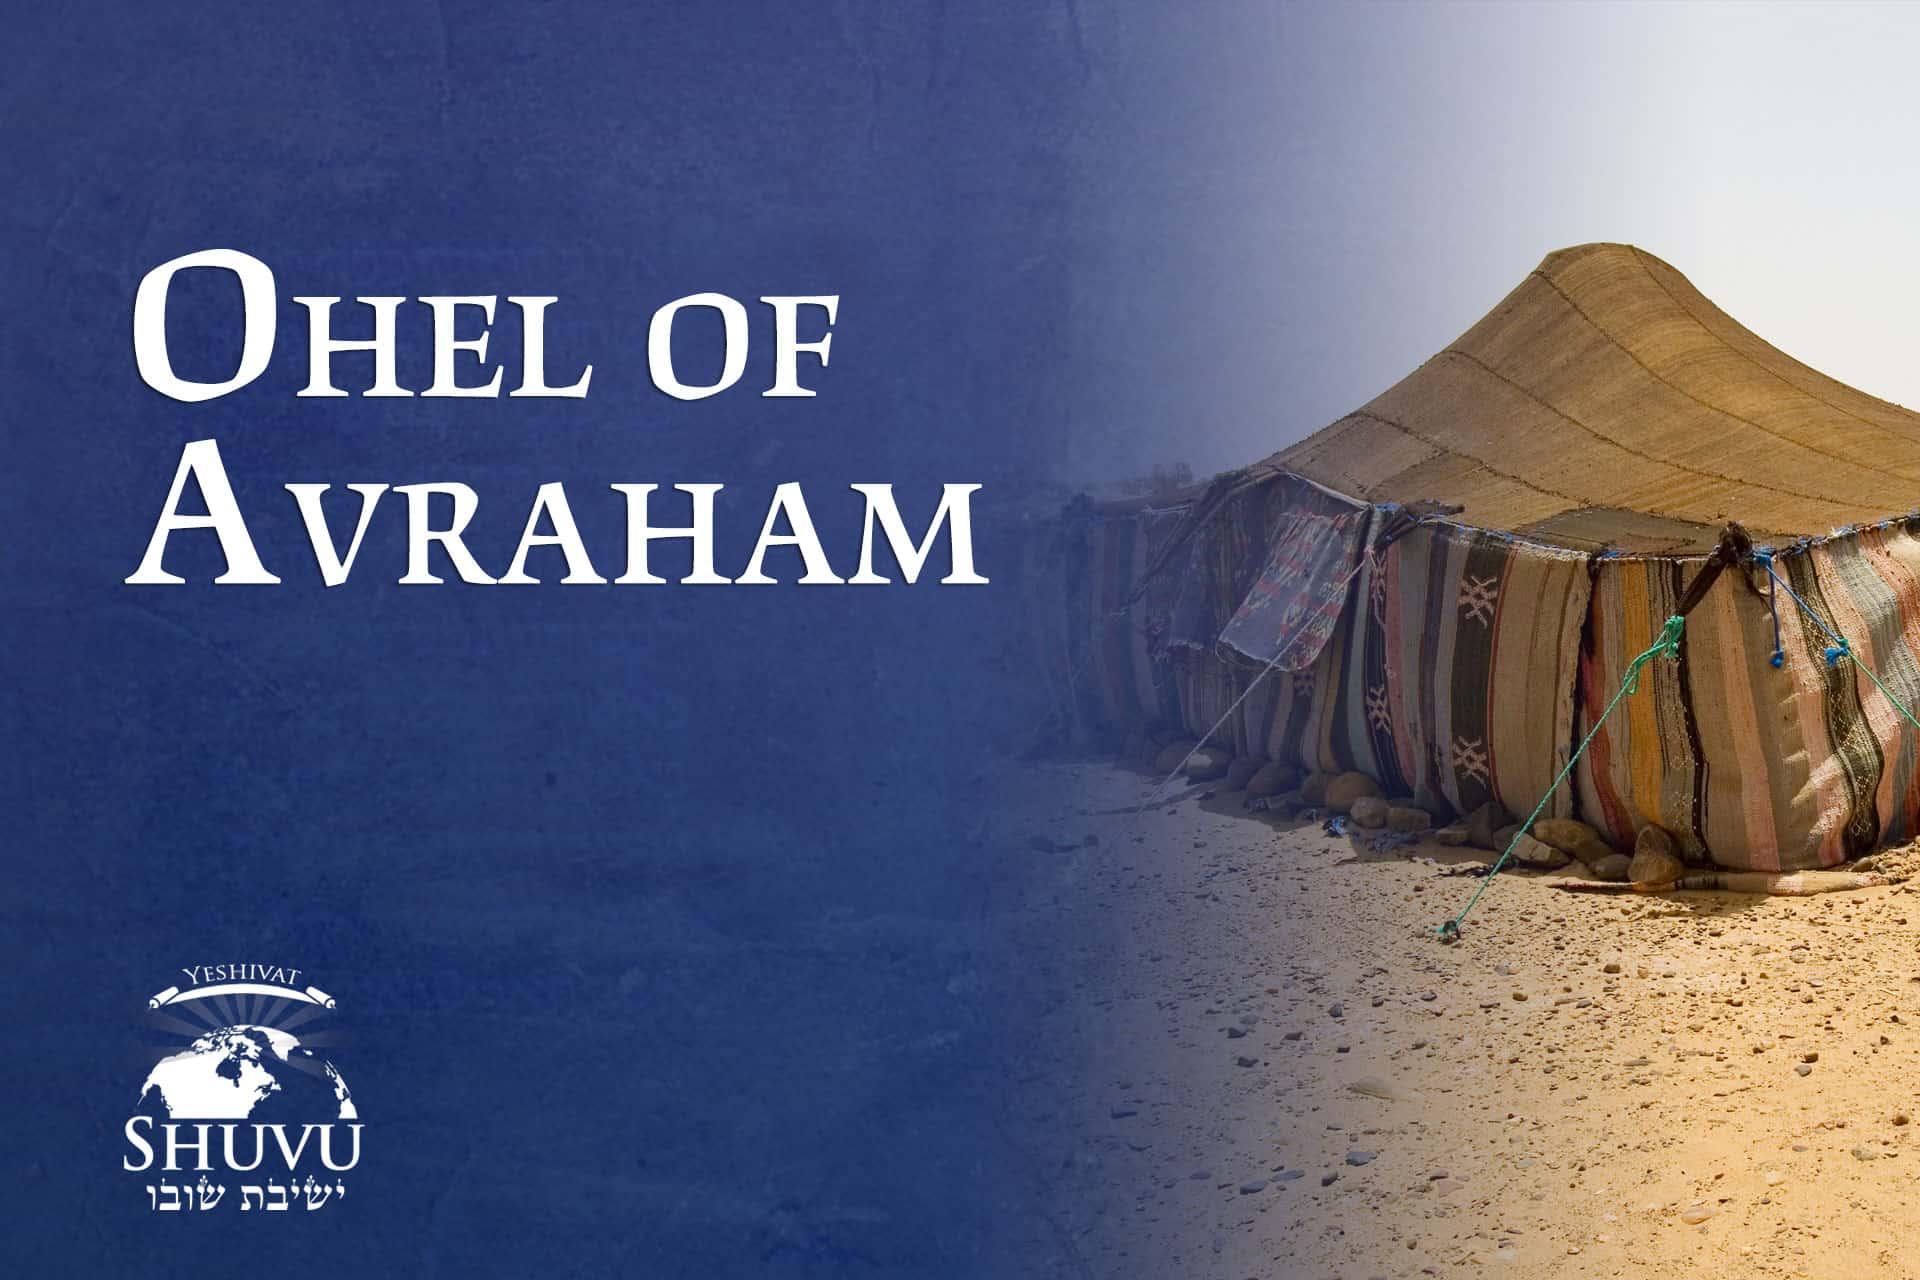 cover_yeshivat_shuvu_ohel_avraham_ENG